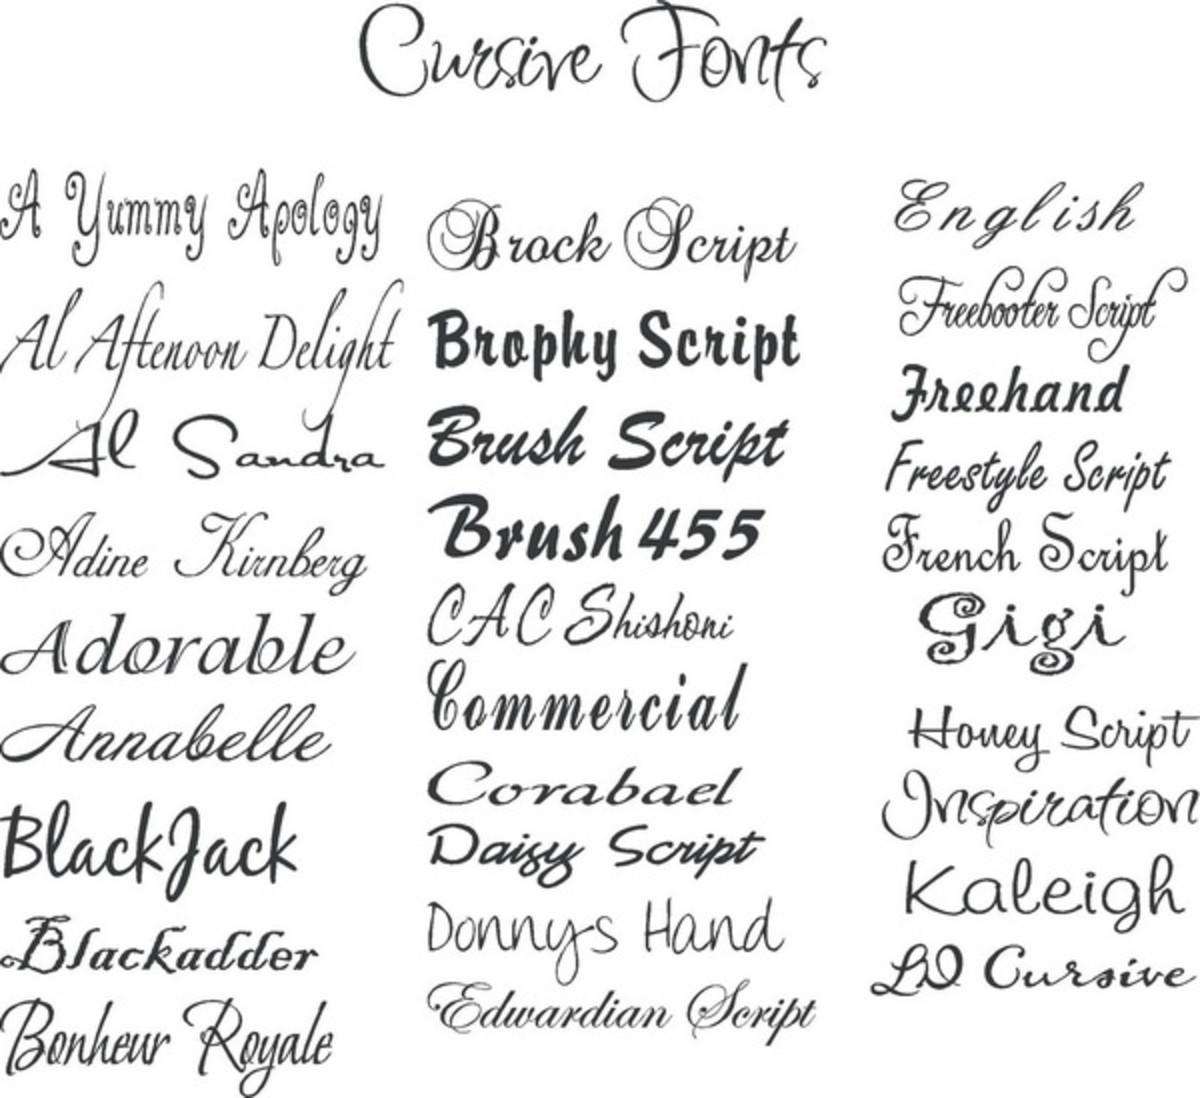 making ebook fonts look like a book